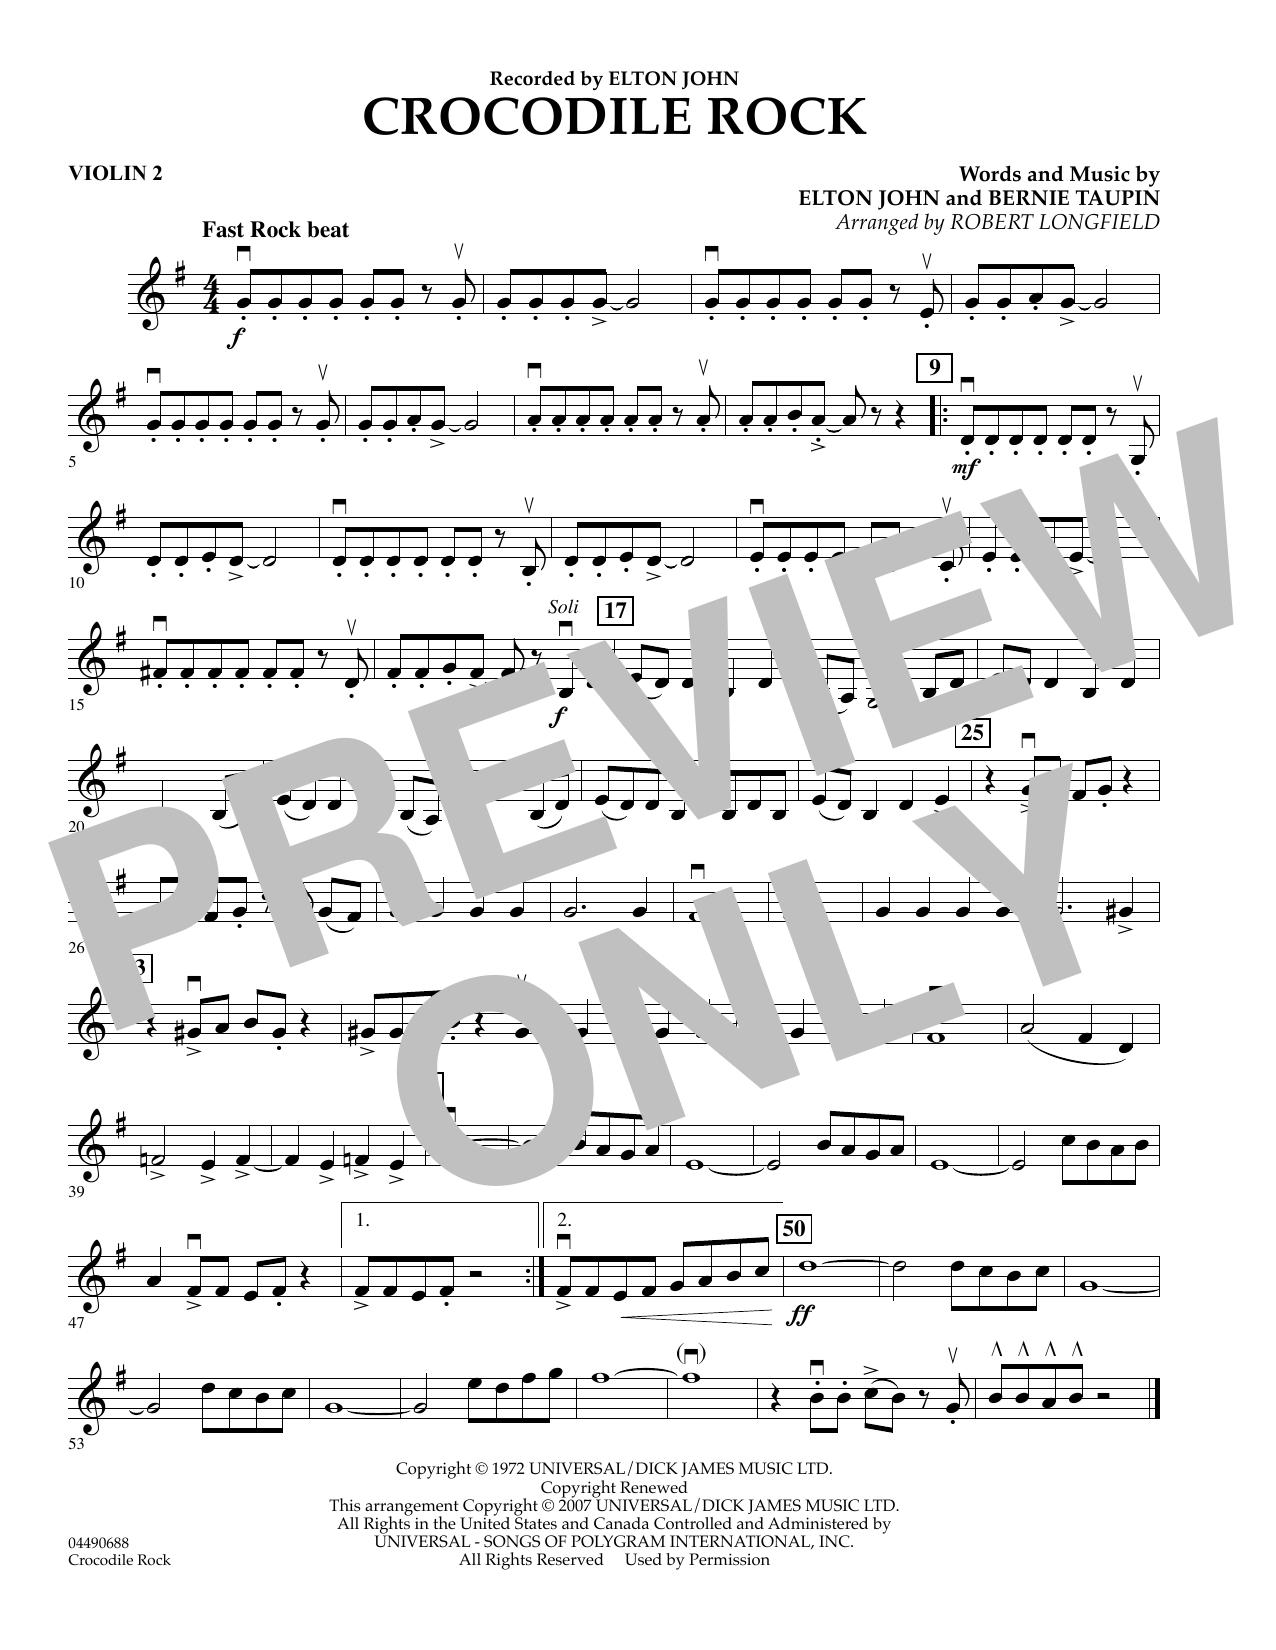 Crocodile Rock - Violin 2 atStanton's Sheet Music